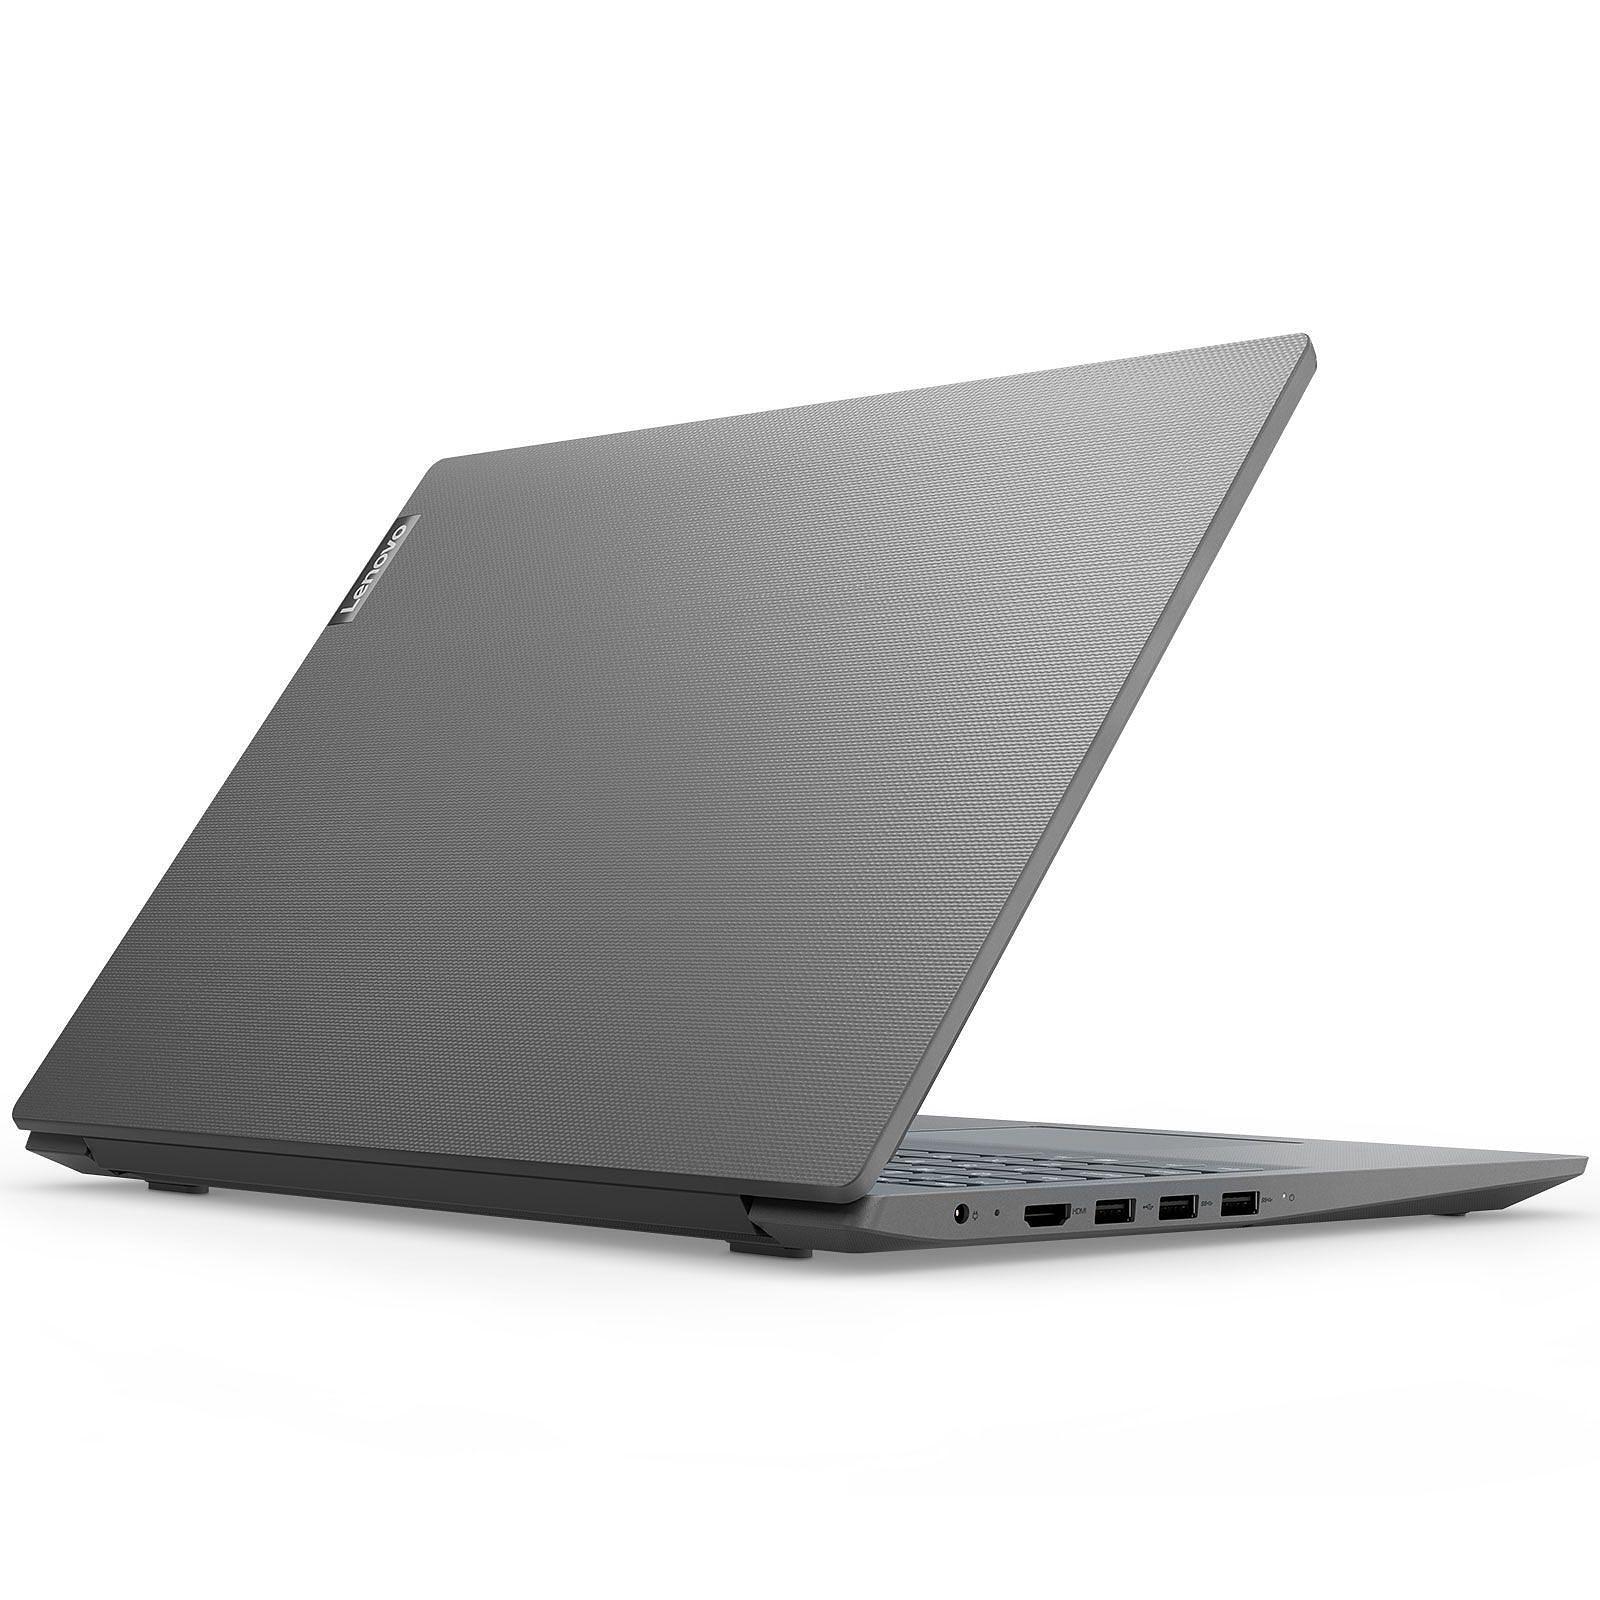 Lenovo 82C500HGFR - PC portable Lenovo - Cybertek.fr - 2